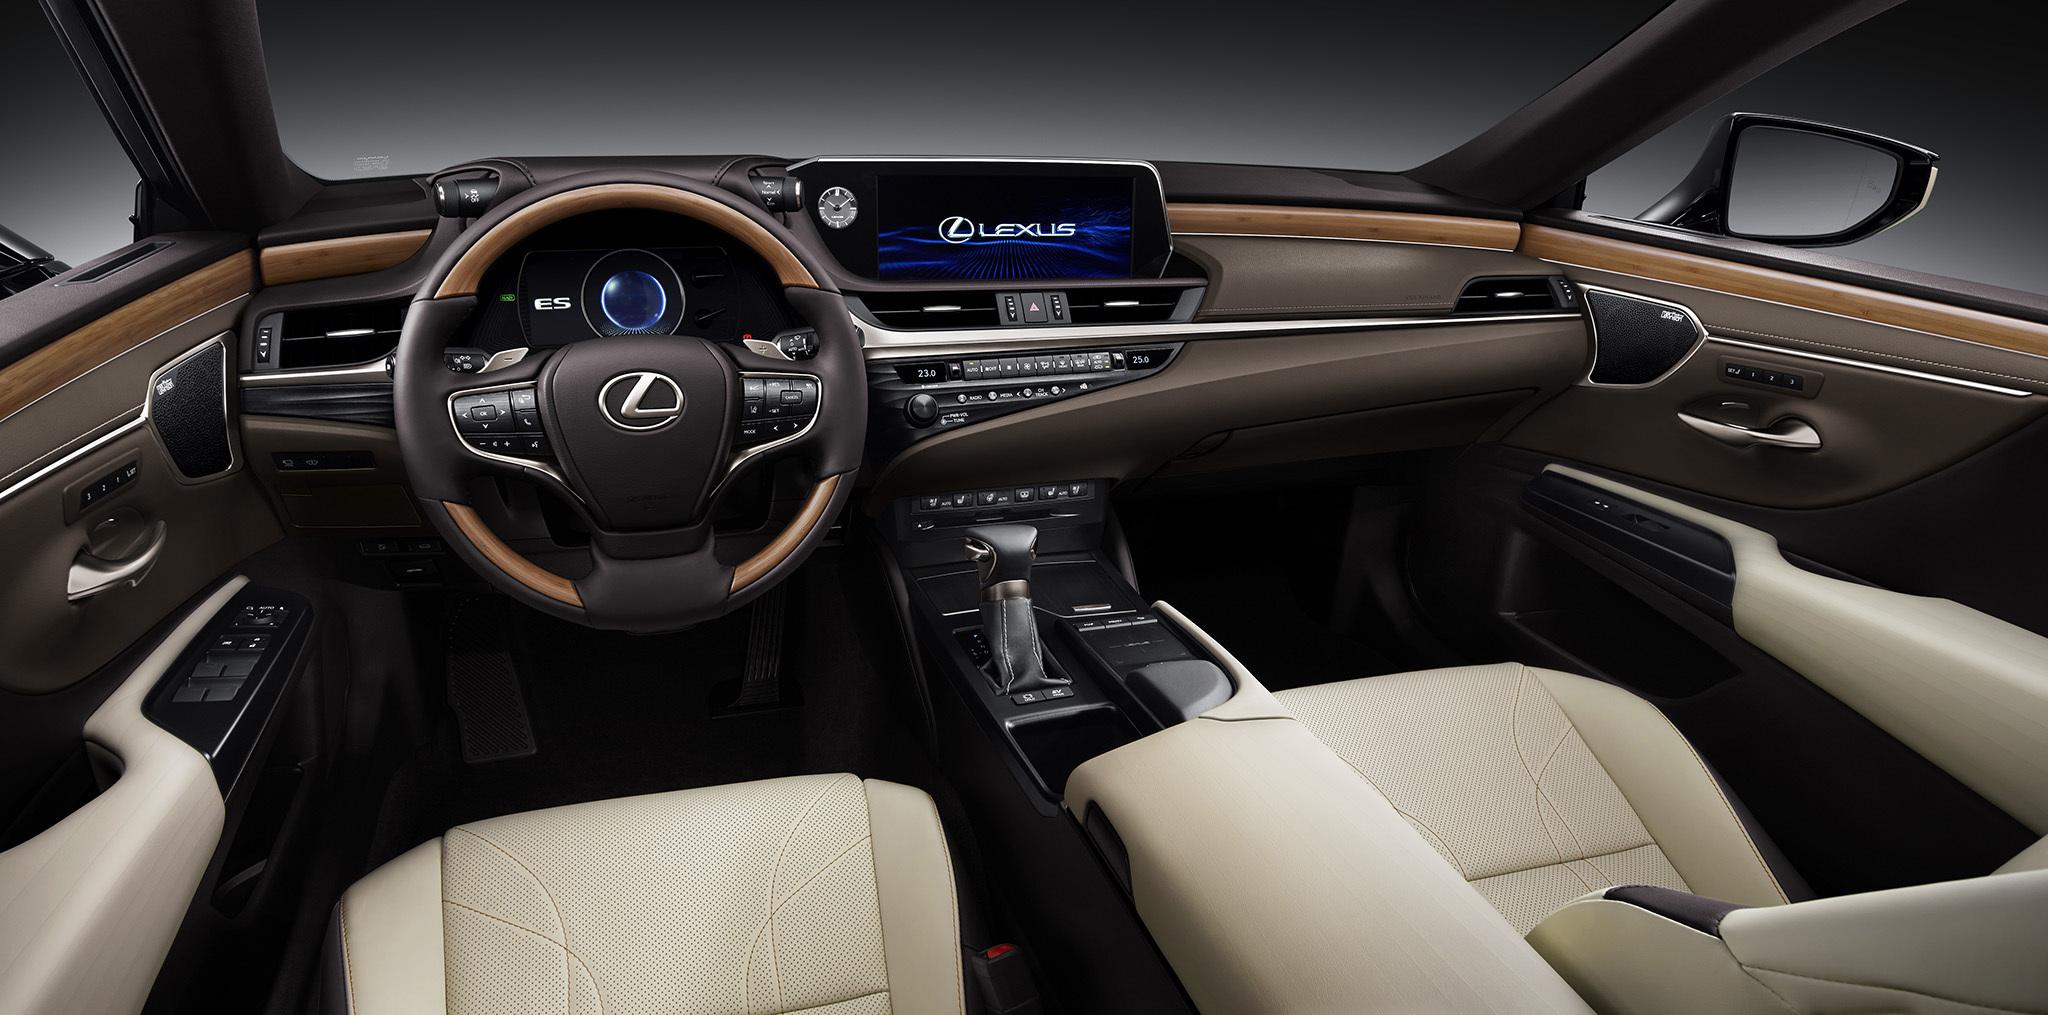 LexusES50_20180830185117623.jpg